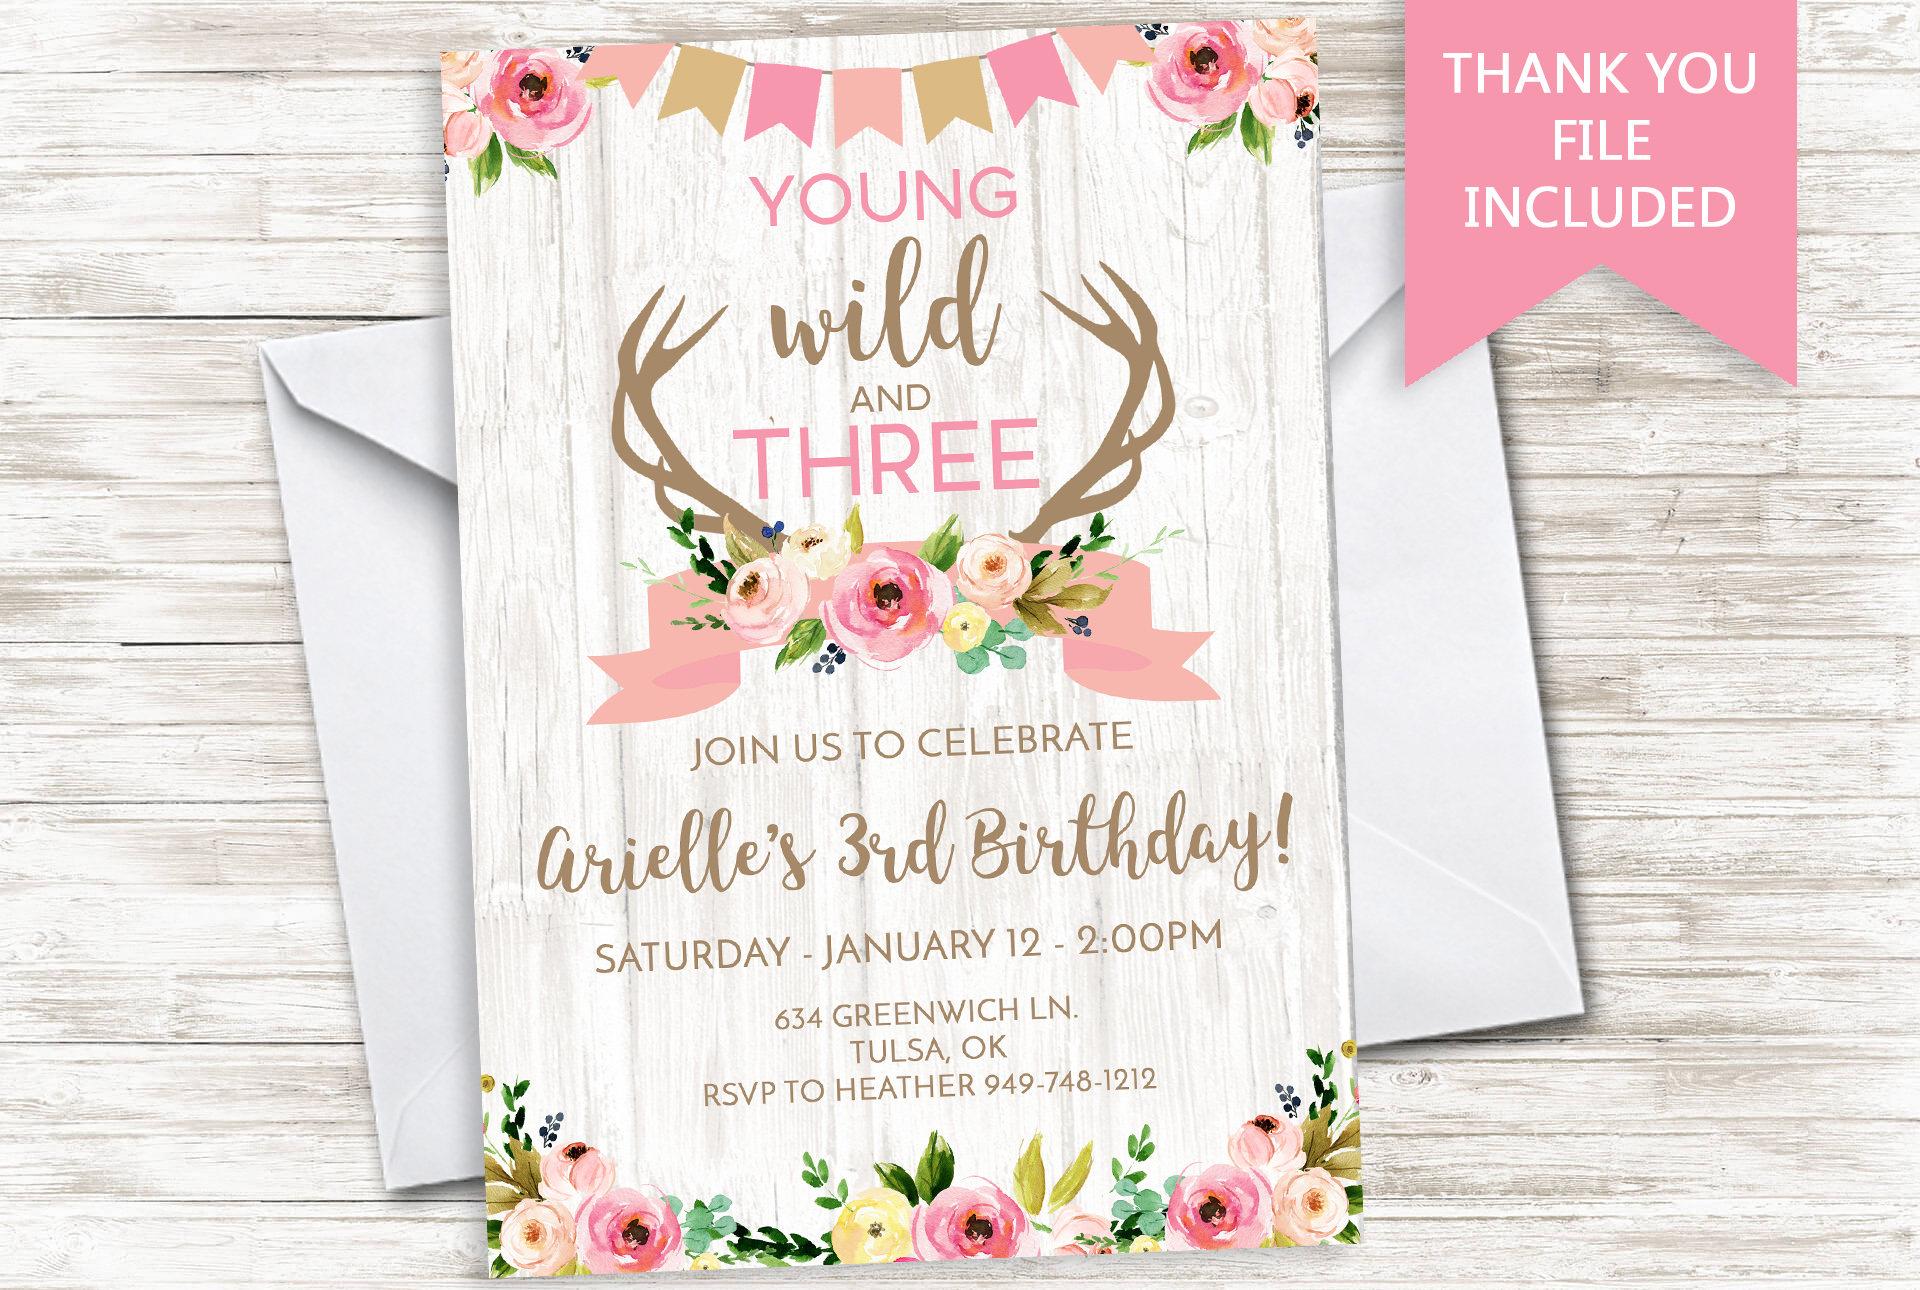 Young Wild Three Invitation Invite Birthday Digital 5x7 Boho